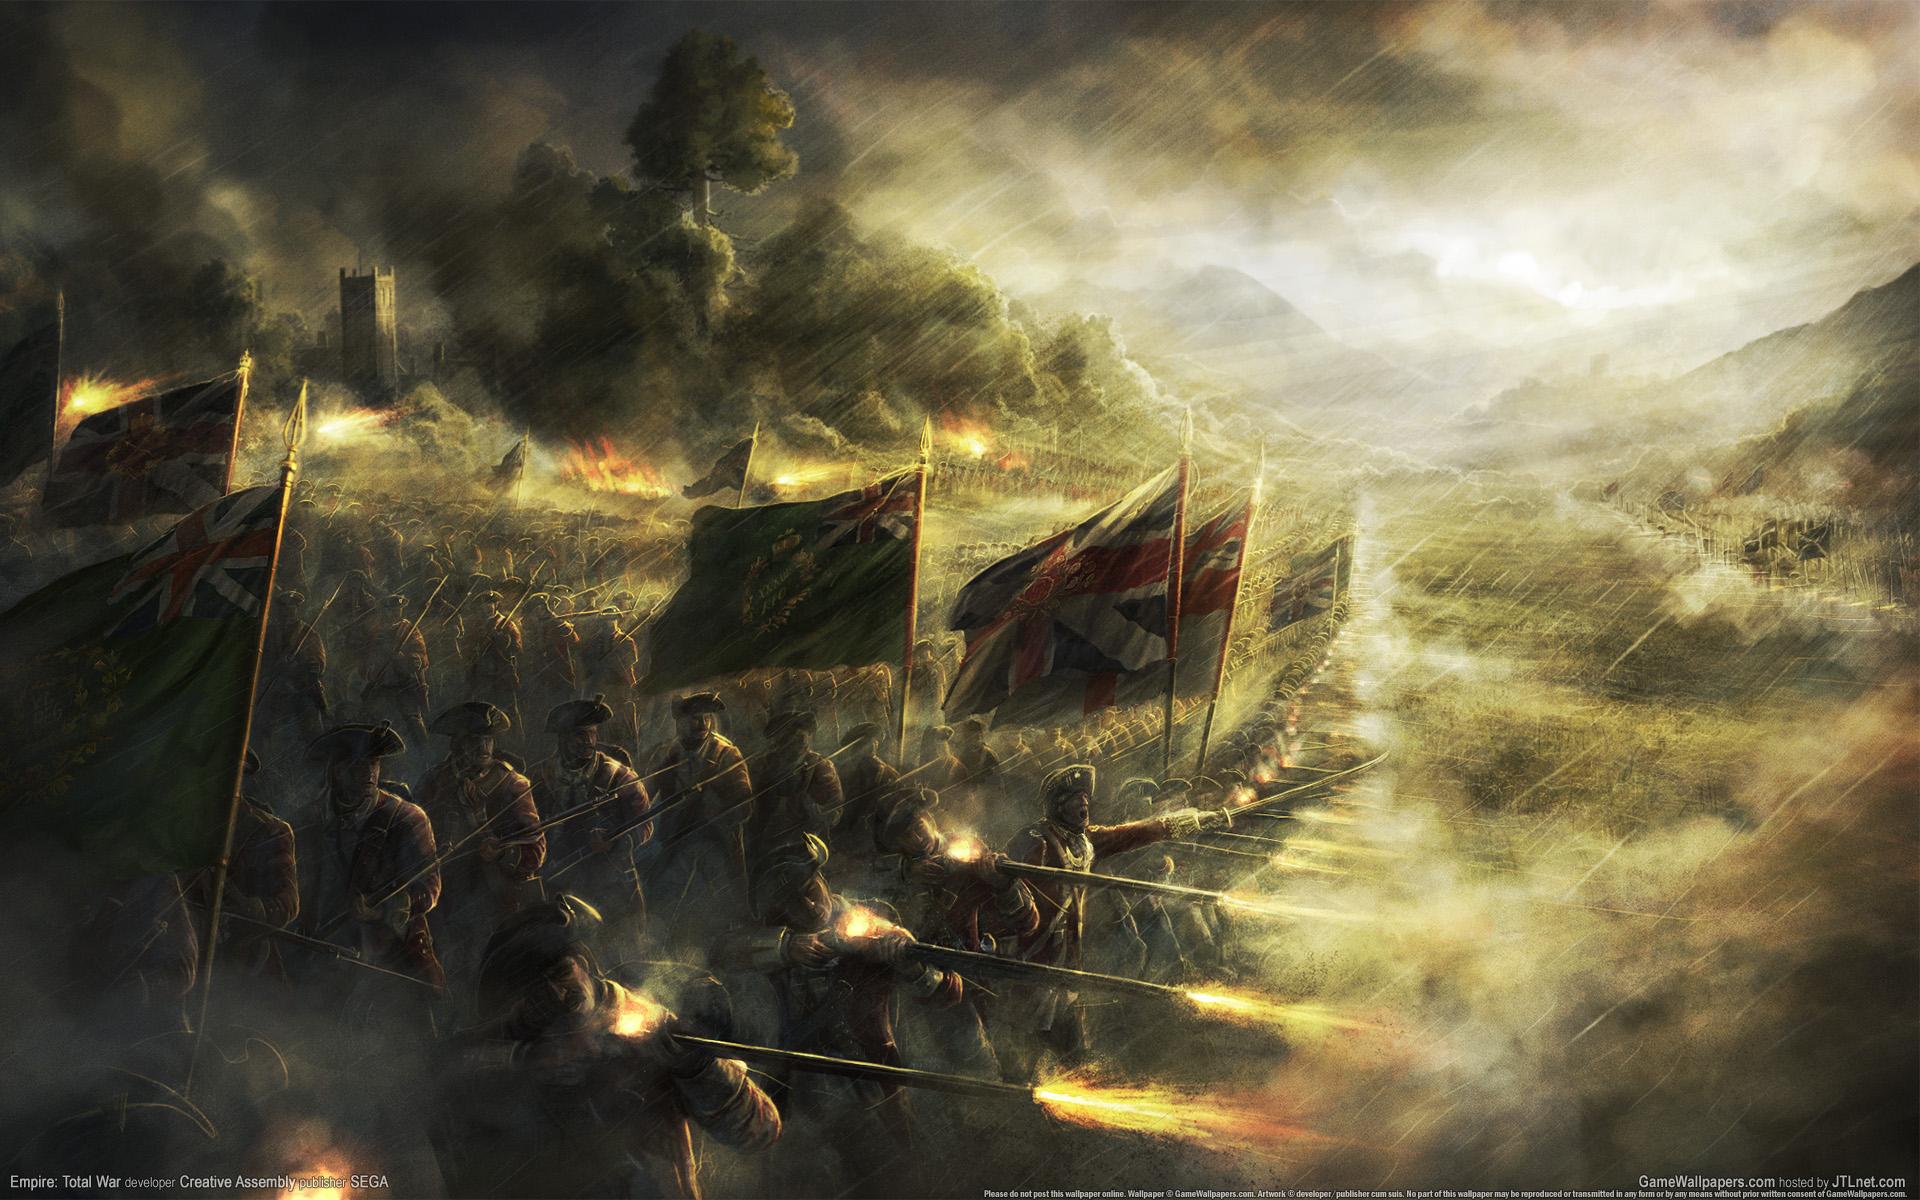 Empire Total War 6 Wallpapers HD Wallpapers 1920x1200